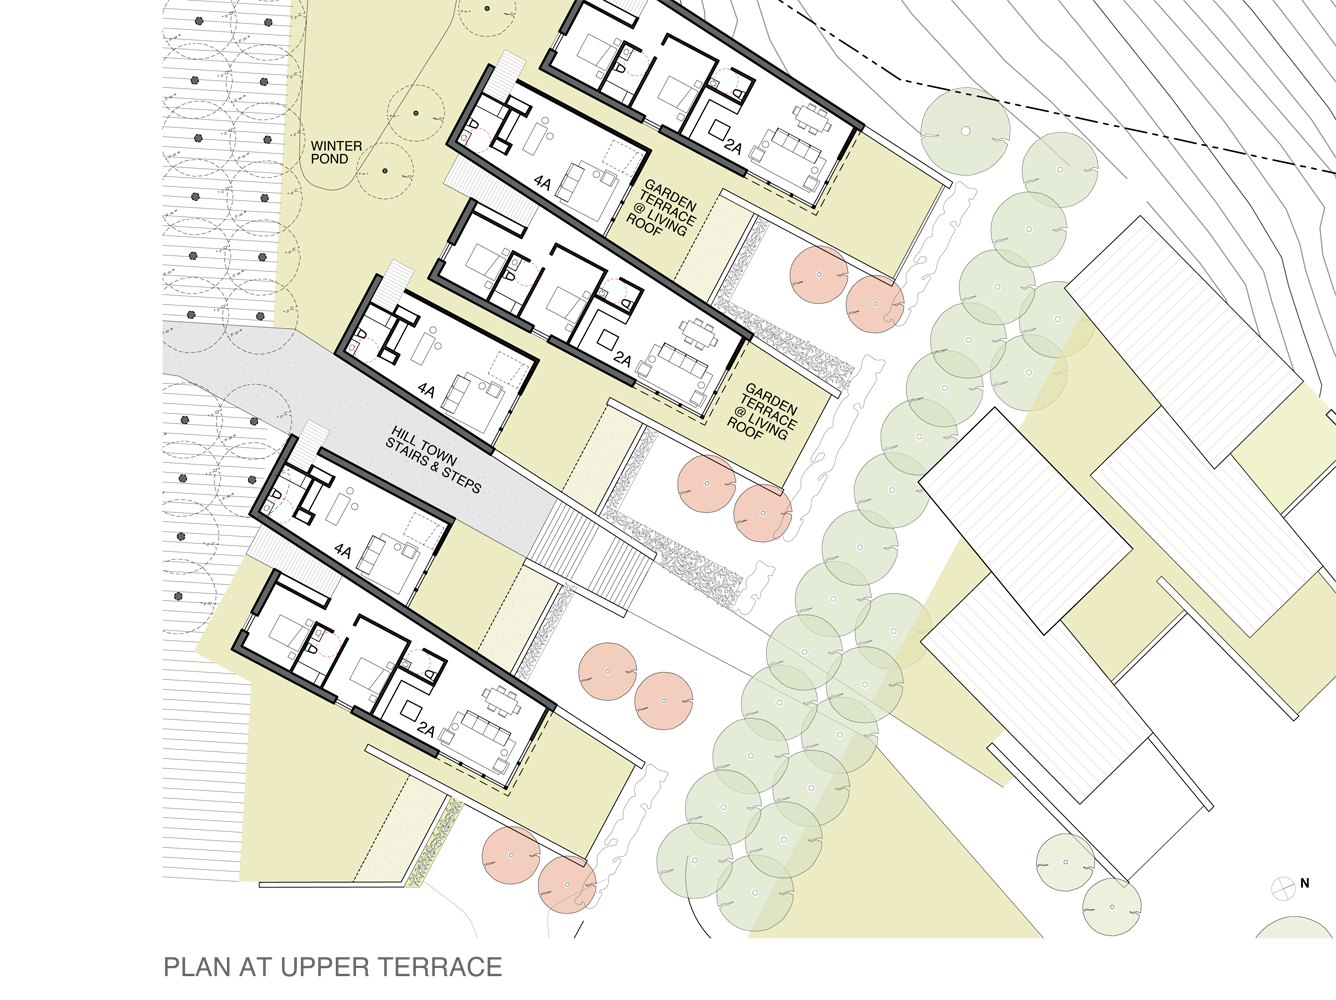 06_Plan-at-Upper-Terrace-Misty-Ct-Hilltown.png